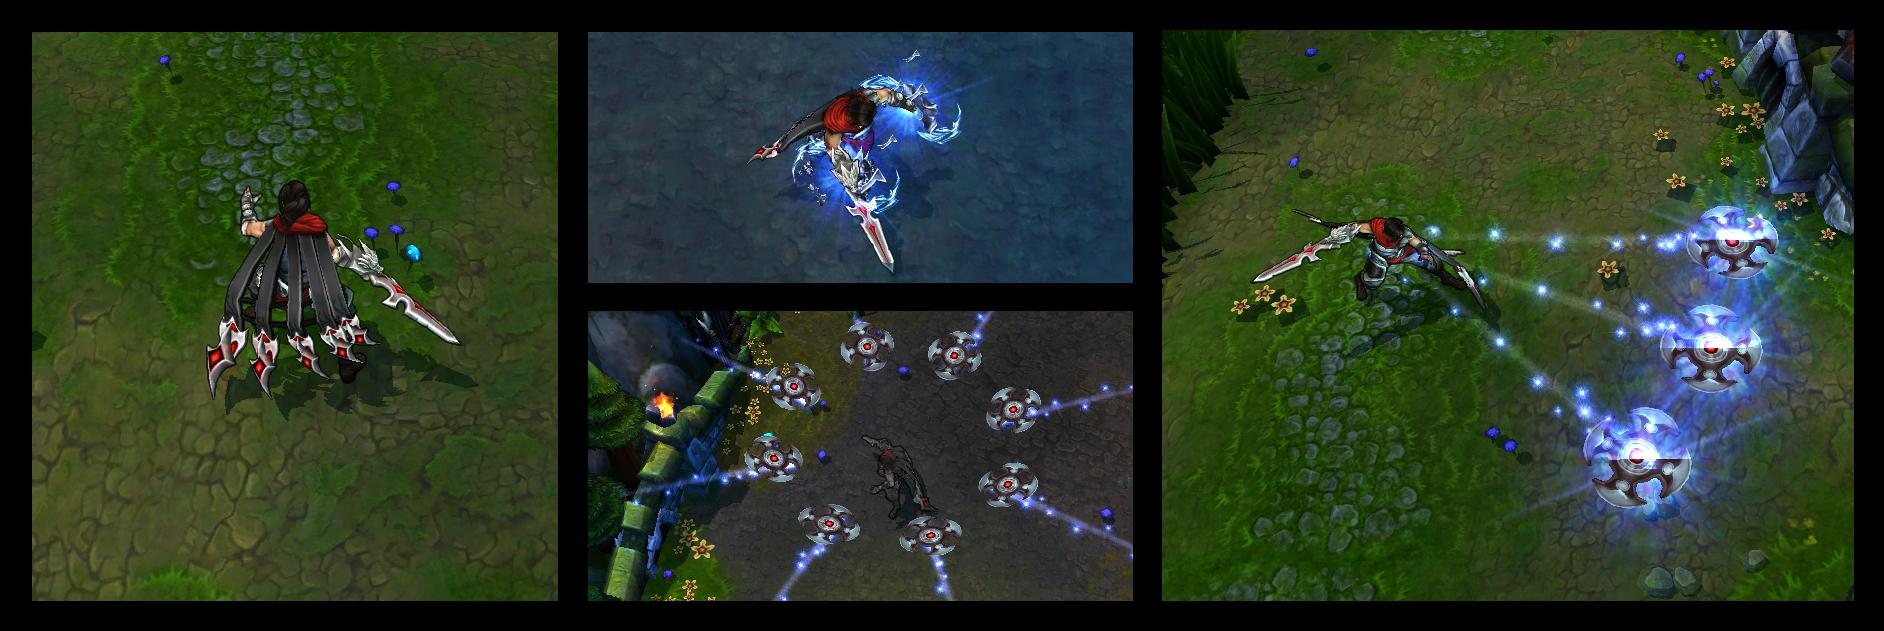 Talon Dragonblade Screenshots.jpg